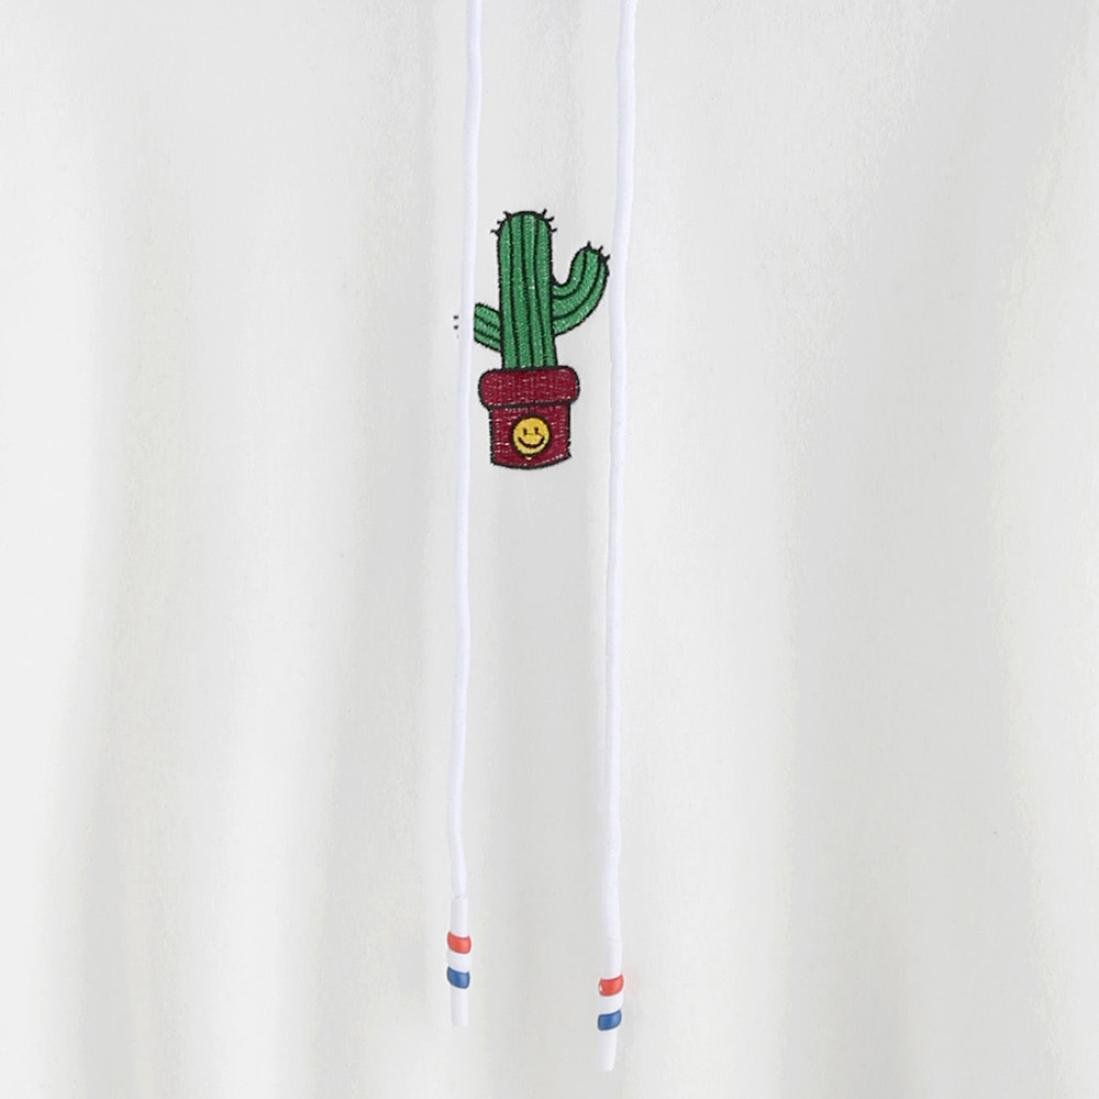 Longra Damen Feather Kapuzenpullover Sport Hoodie Sweatshirts Oversize Oberteil Pullover Herbst Damen Strickpullover Kapuzensweatshirt Kapuzenjacke